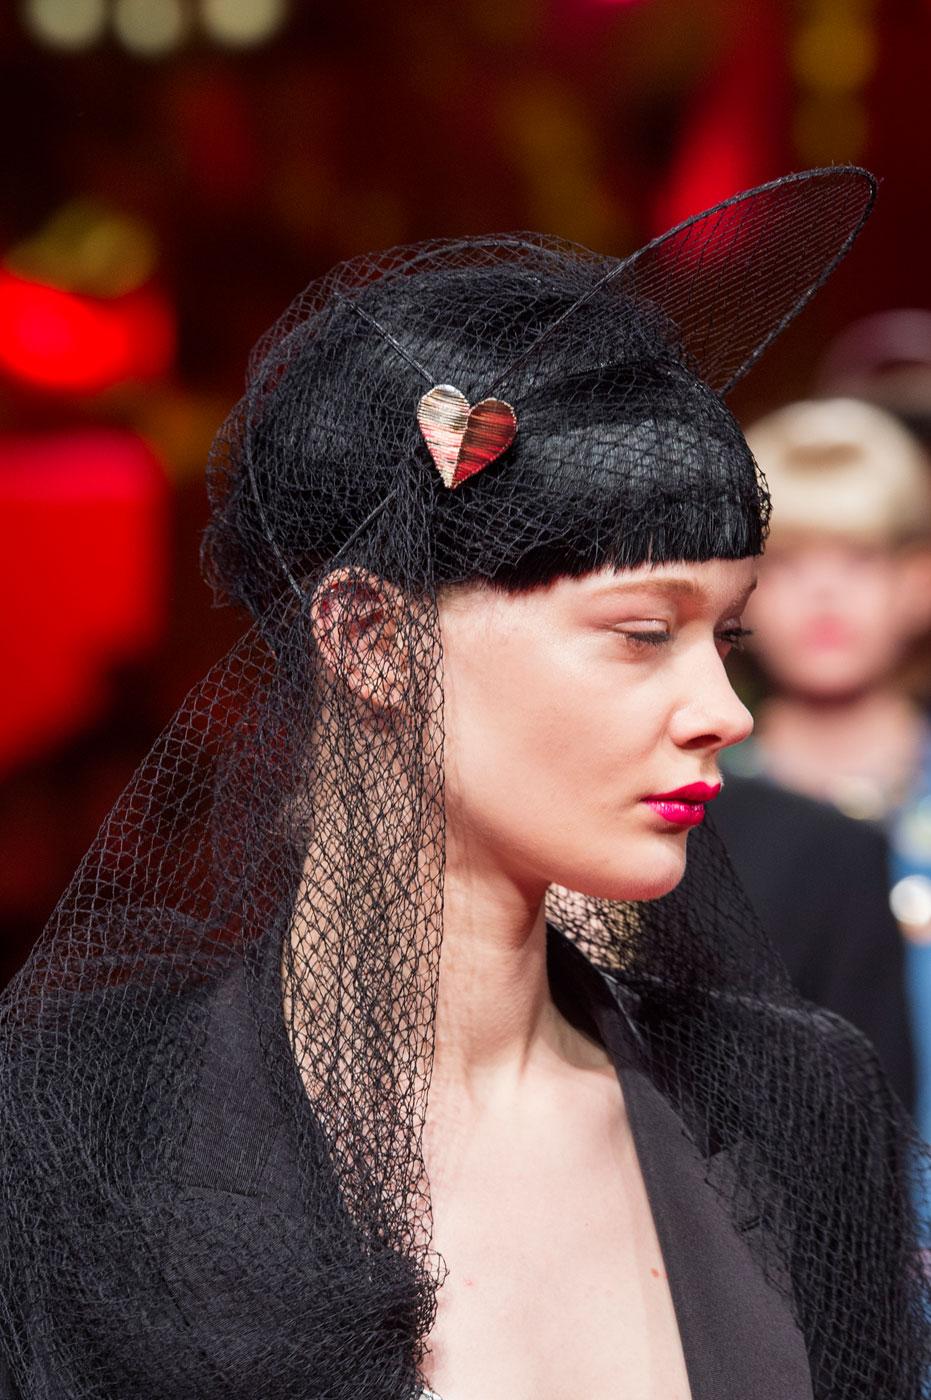 Schiaparelli-fashion-runway-show-close-ups-haute-couture-paris-spring-summer-2015-the-impression-47